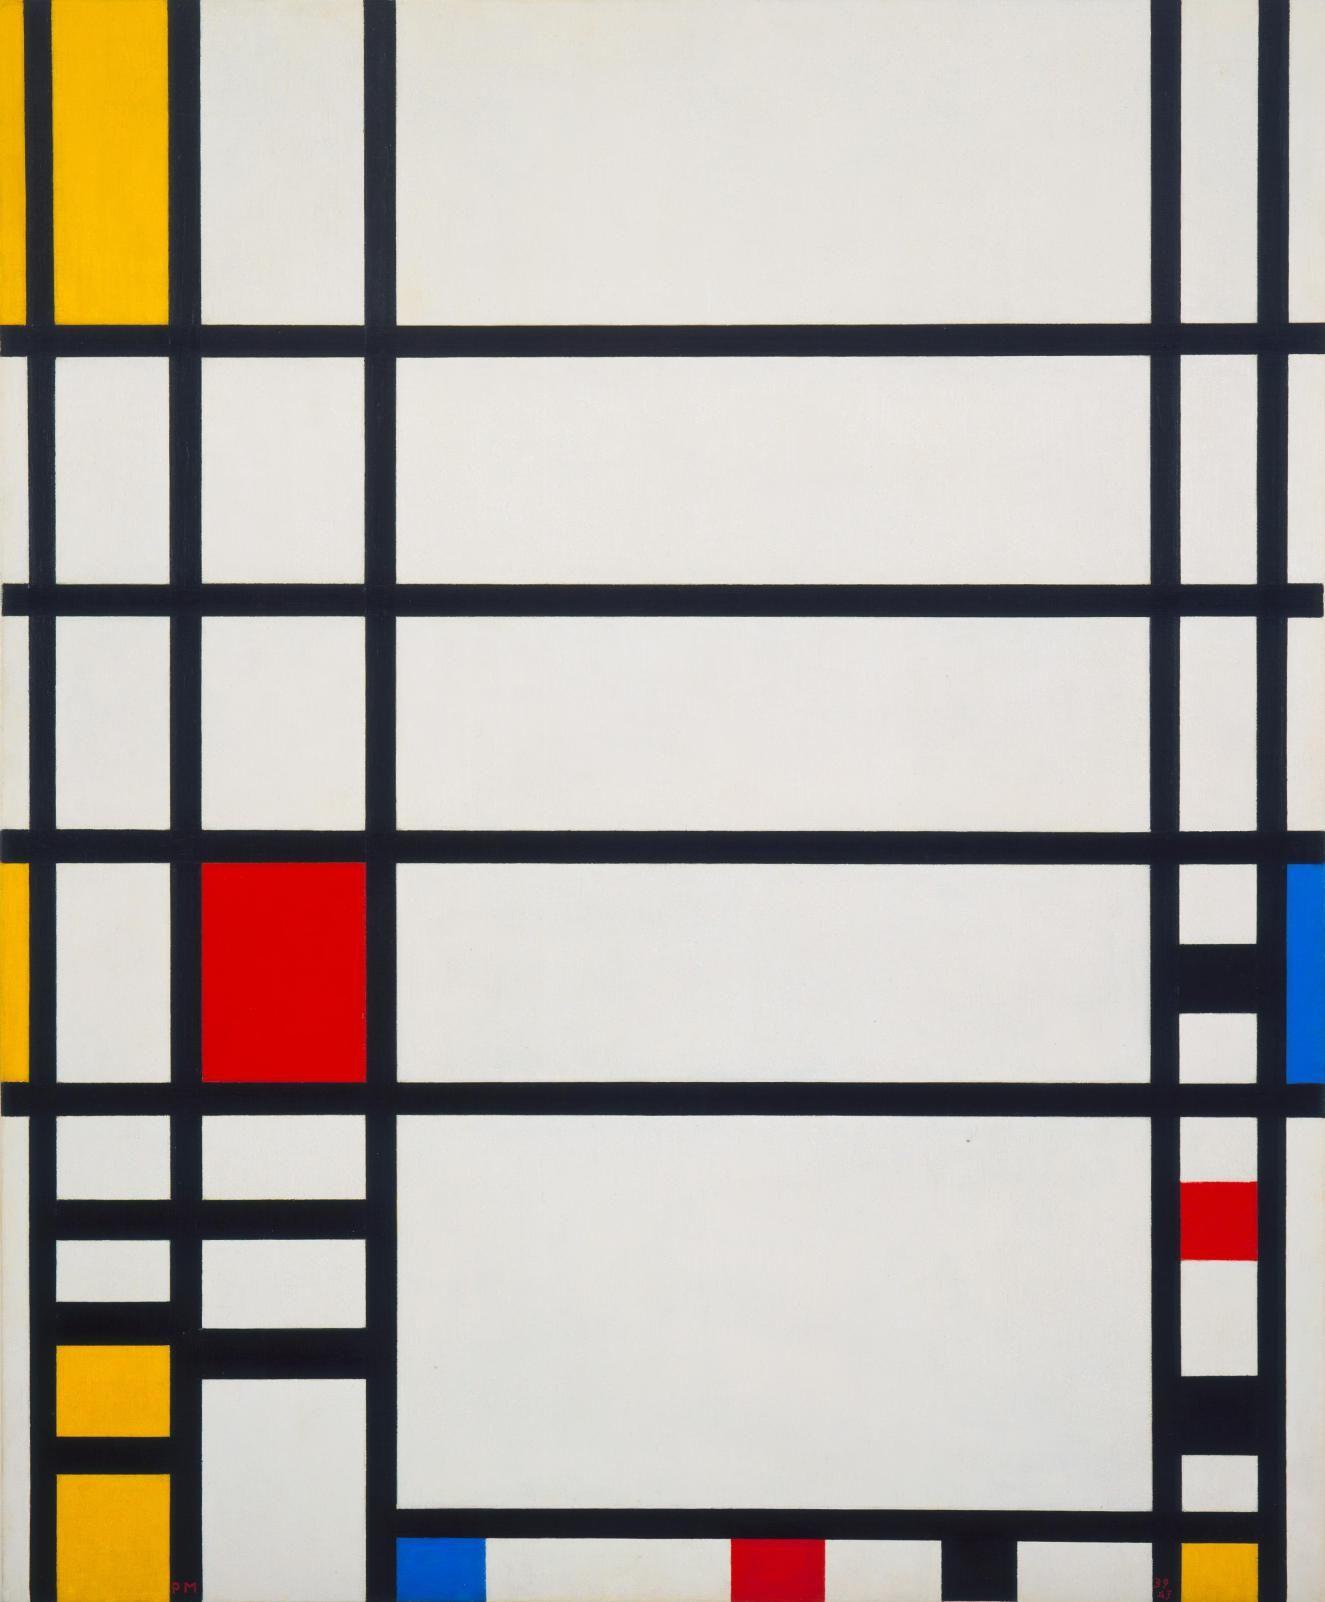 Piet Mondrian, 1872-1944   Trafalgar Square Work Type. Painting Date 1939-43. Material Oil on canvas.